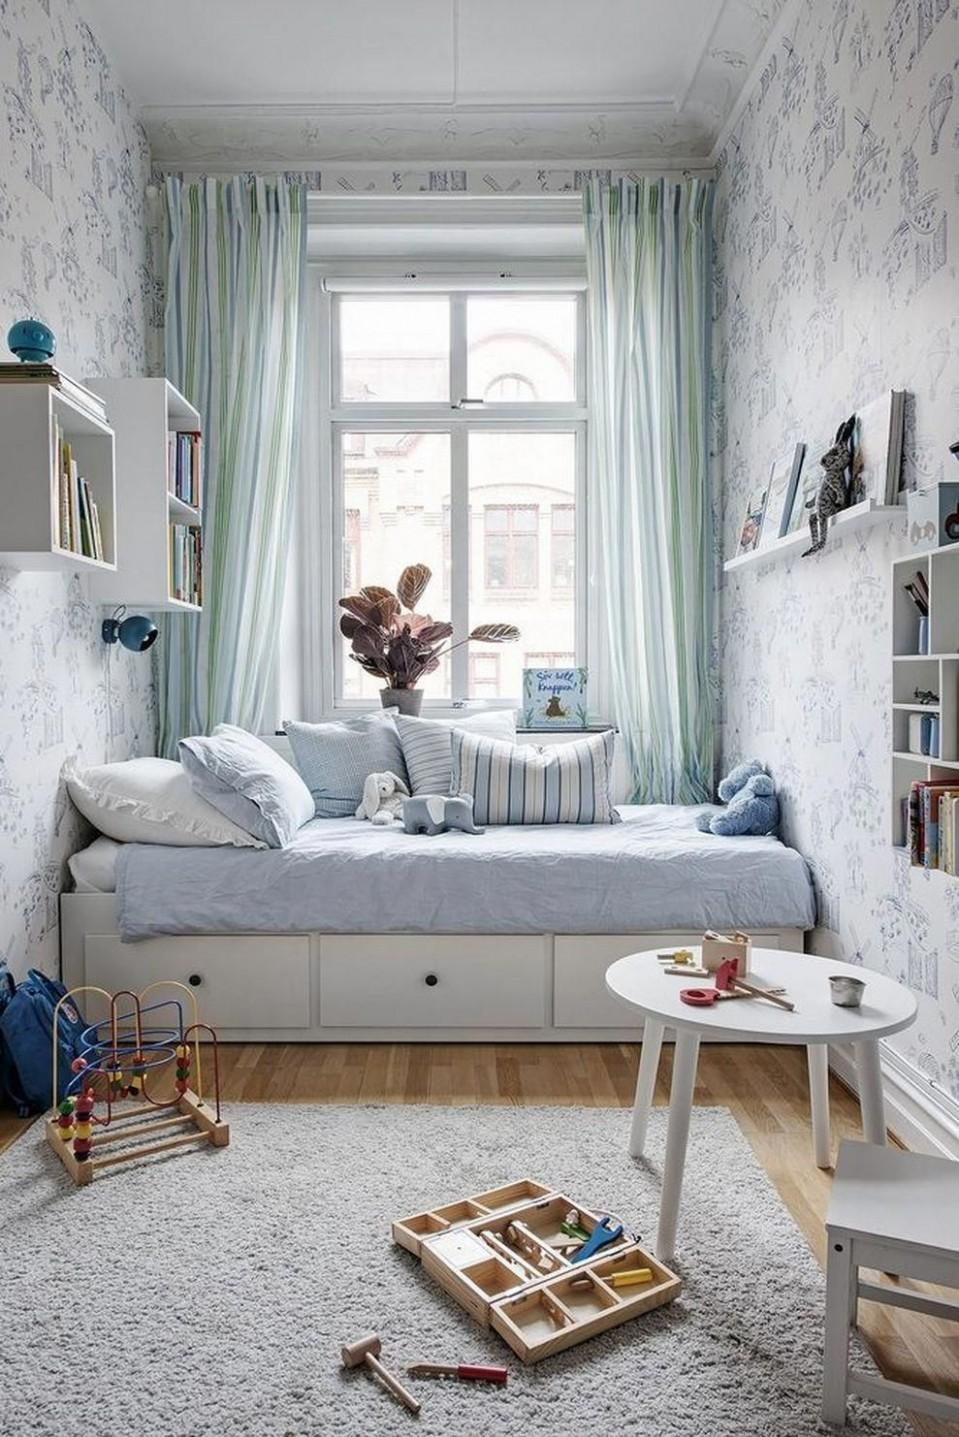 small room design ideas philippines #Smallroomdesign  Apartment  - Bedroom Ideas Philippines